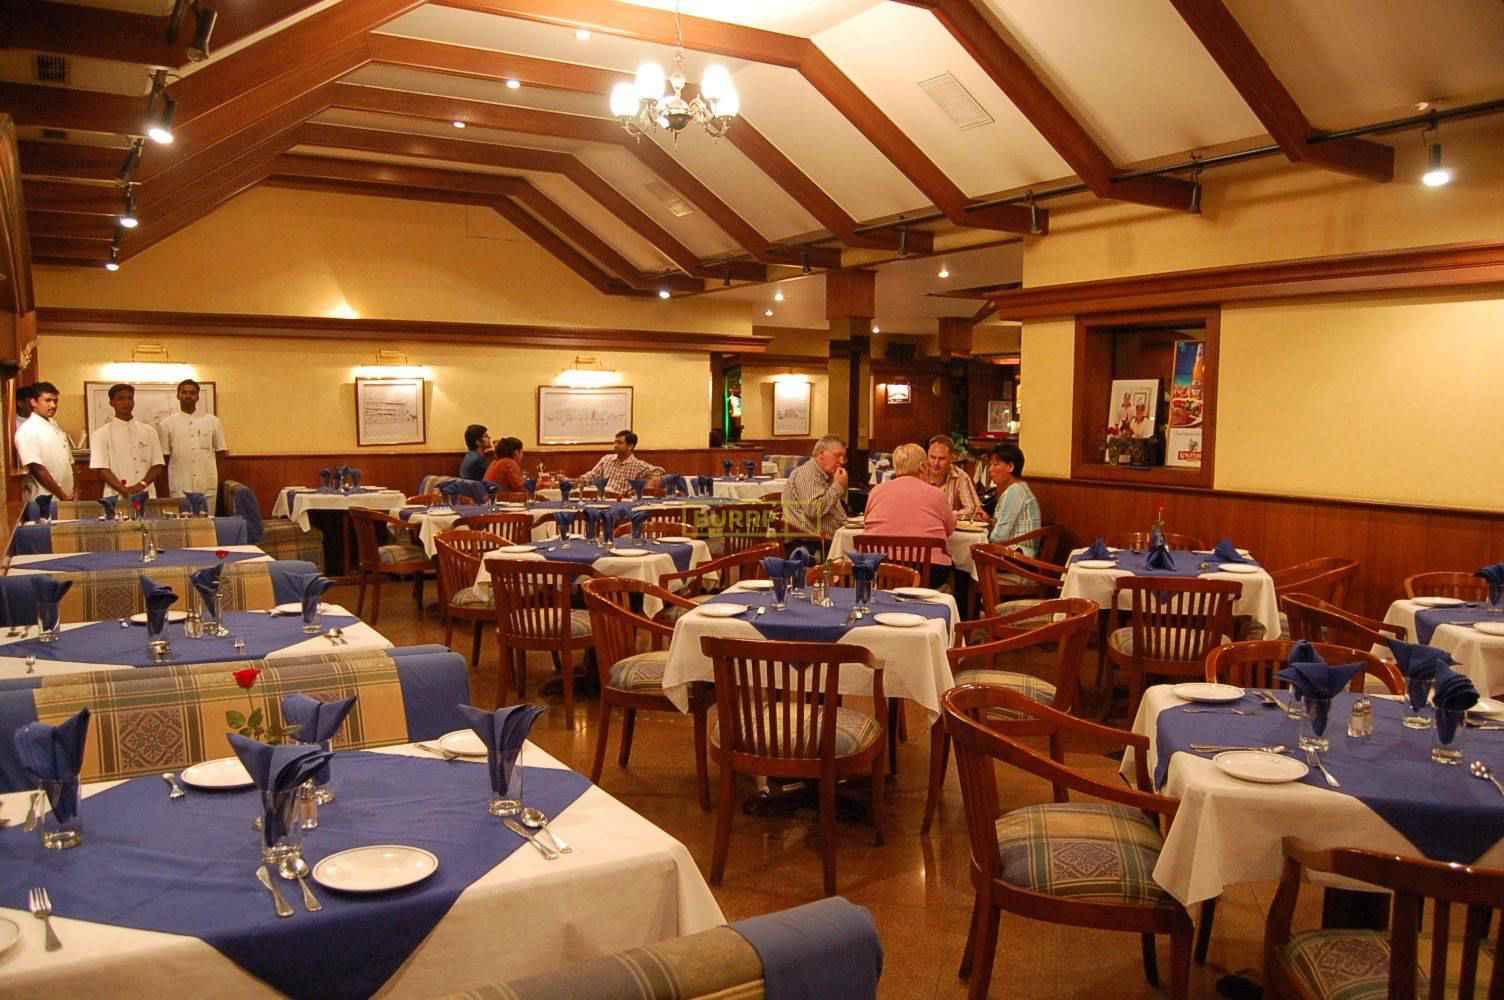 Interior of Koshy's Bar & Restaurant